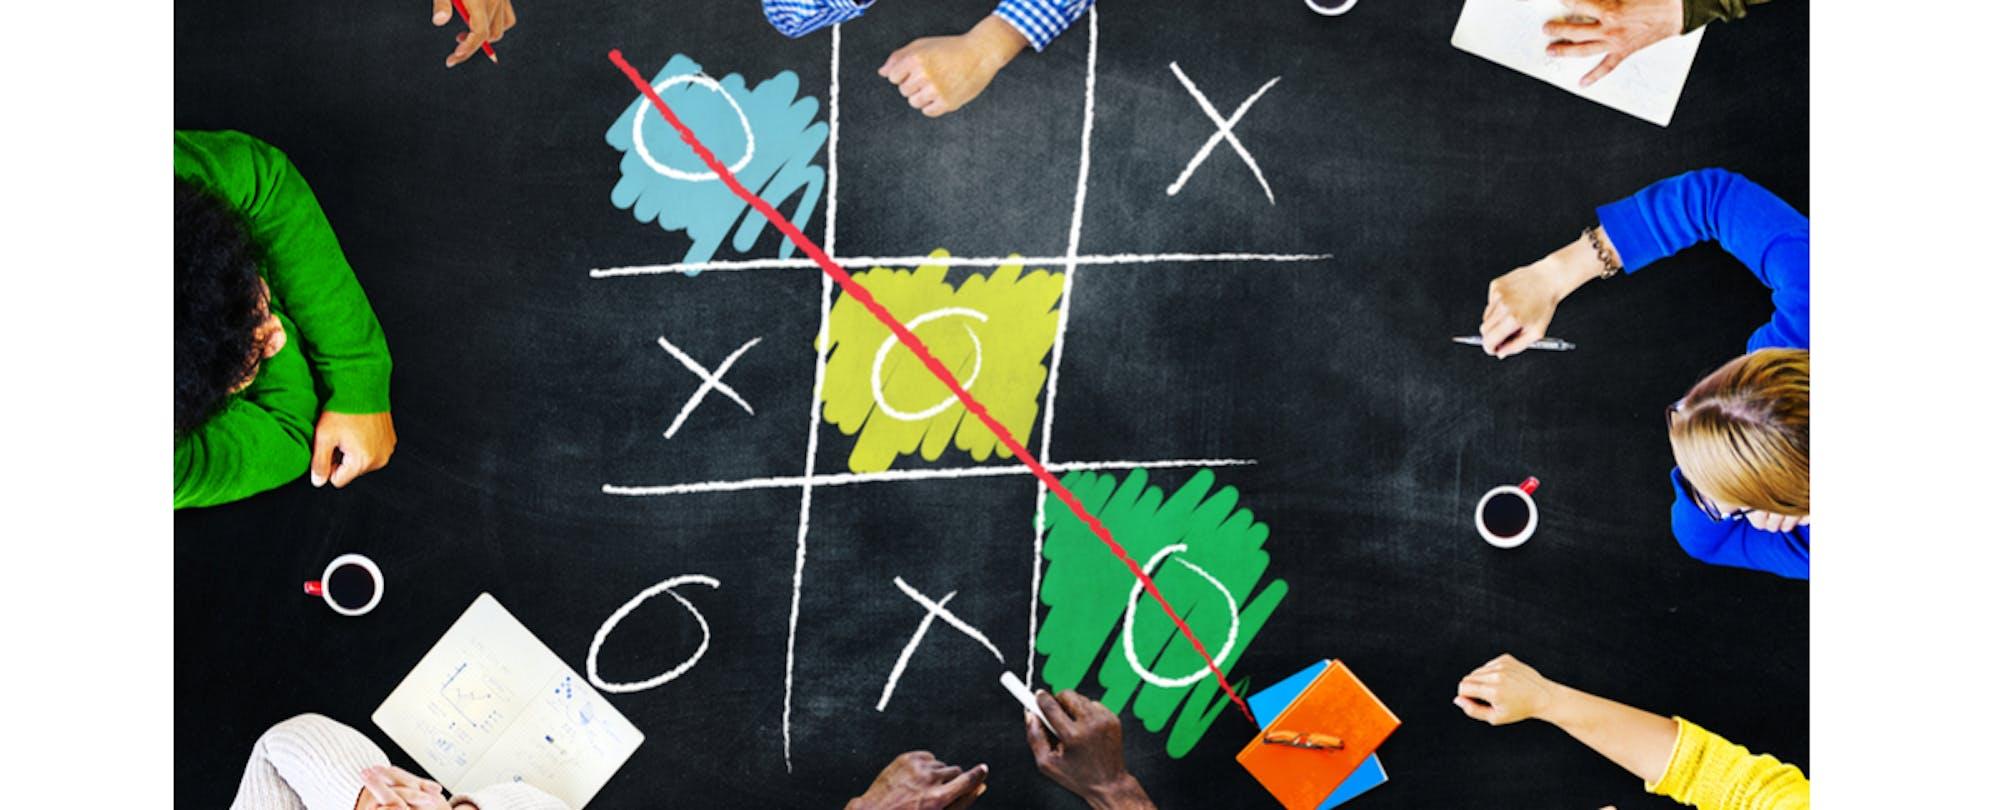 Tic Tac Toe Your Way To Teacher Choice A New Model For Pd Edsurge